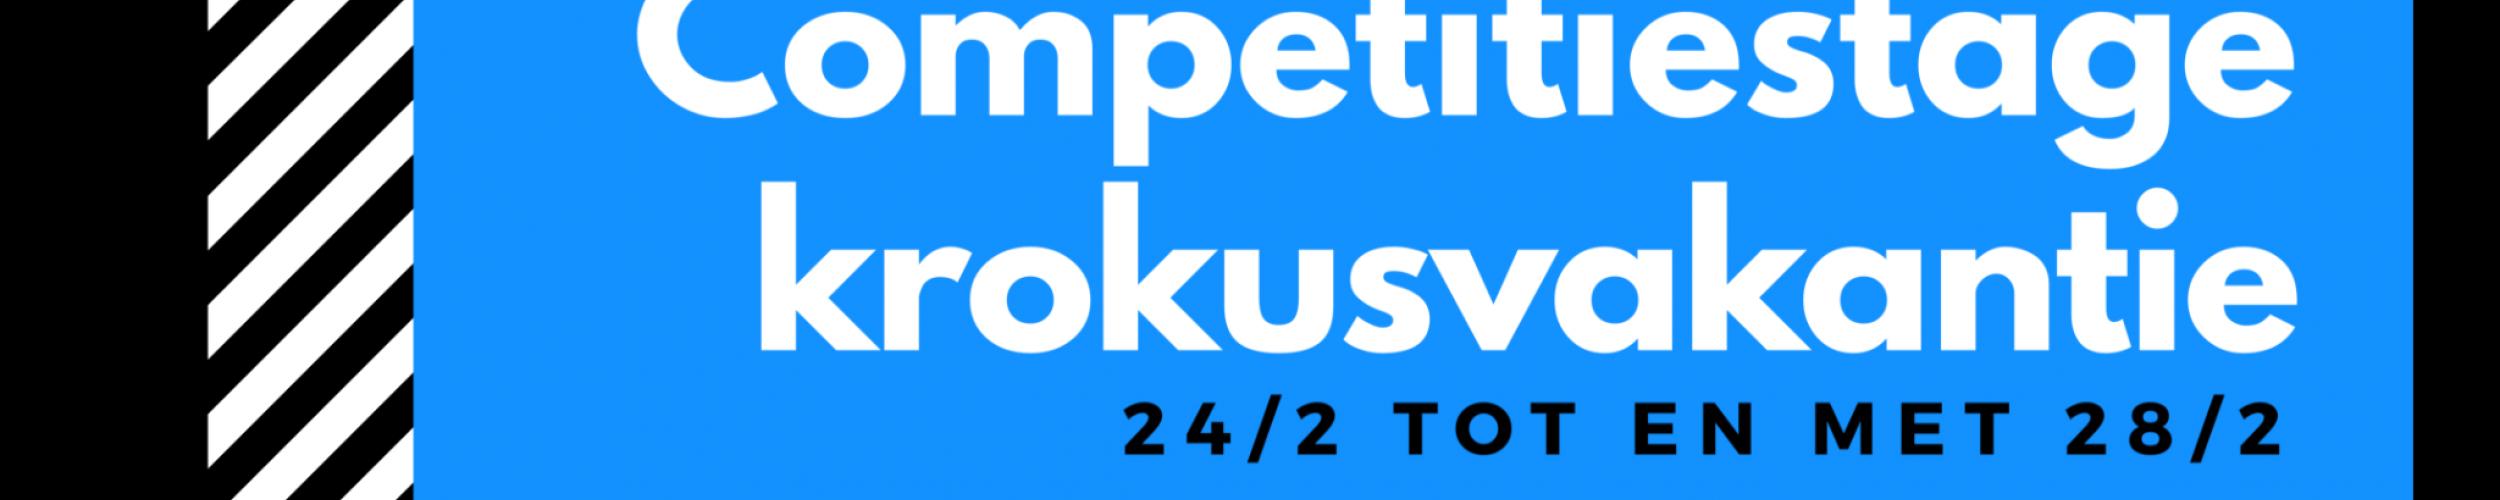 Competitiestage krokusvakantie 2020